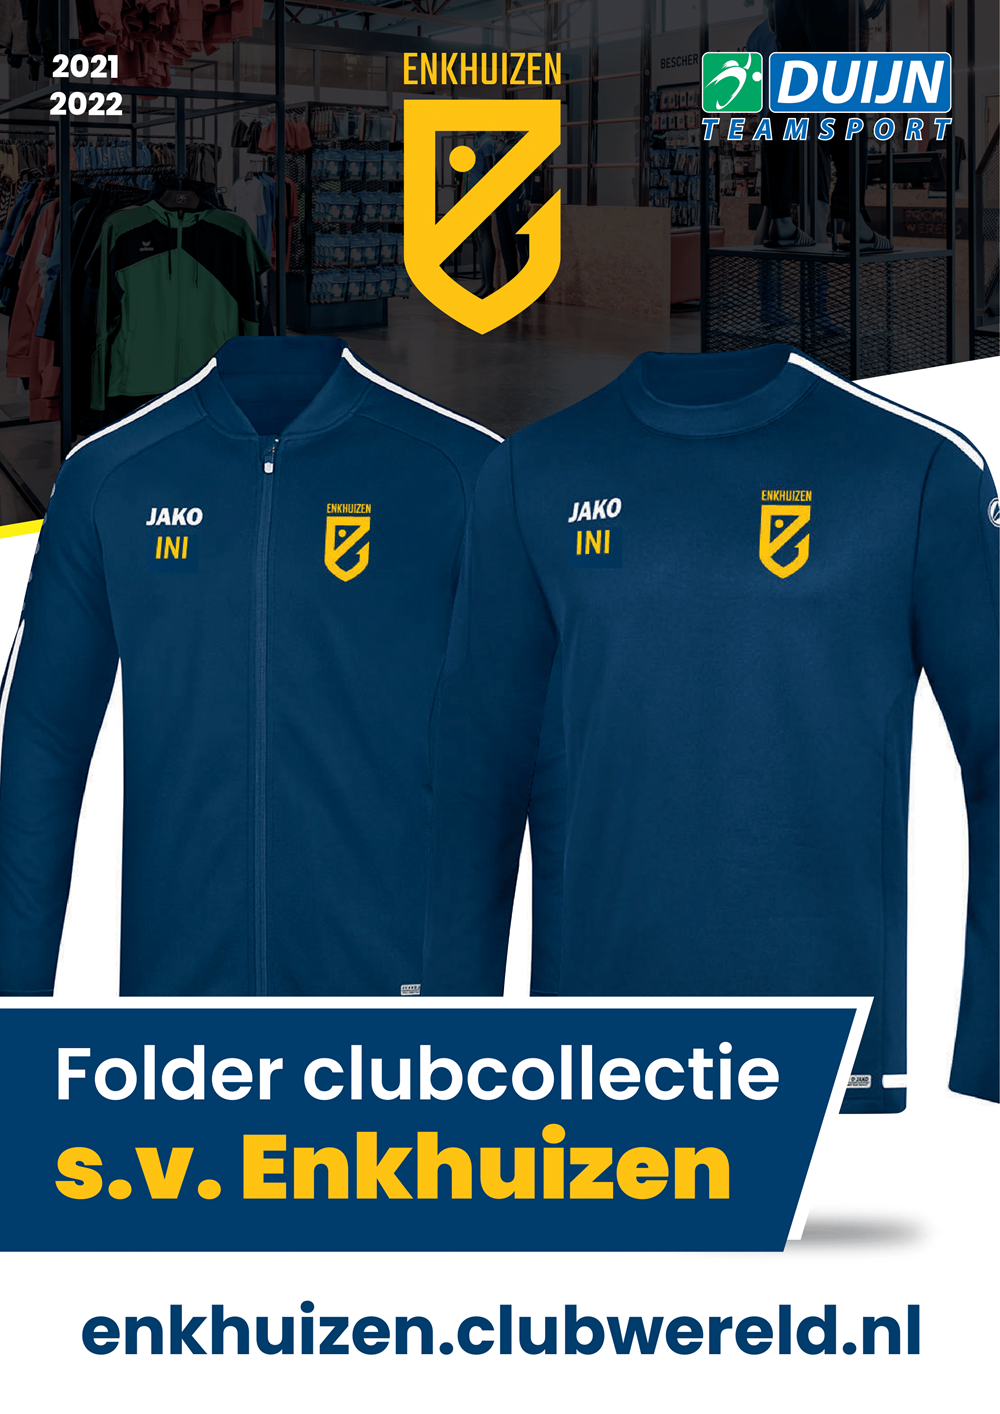 Enkhuizen_-Brochure_2021-2022-1.png